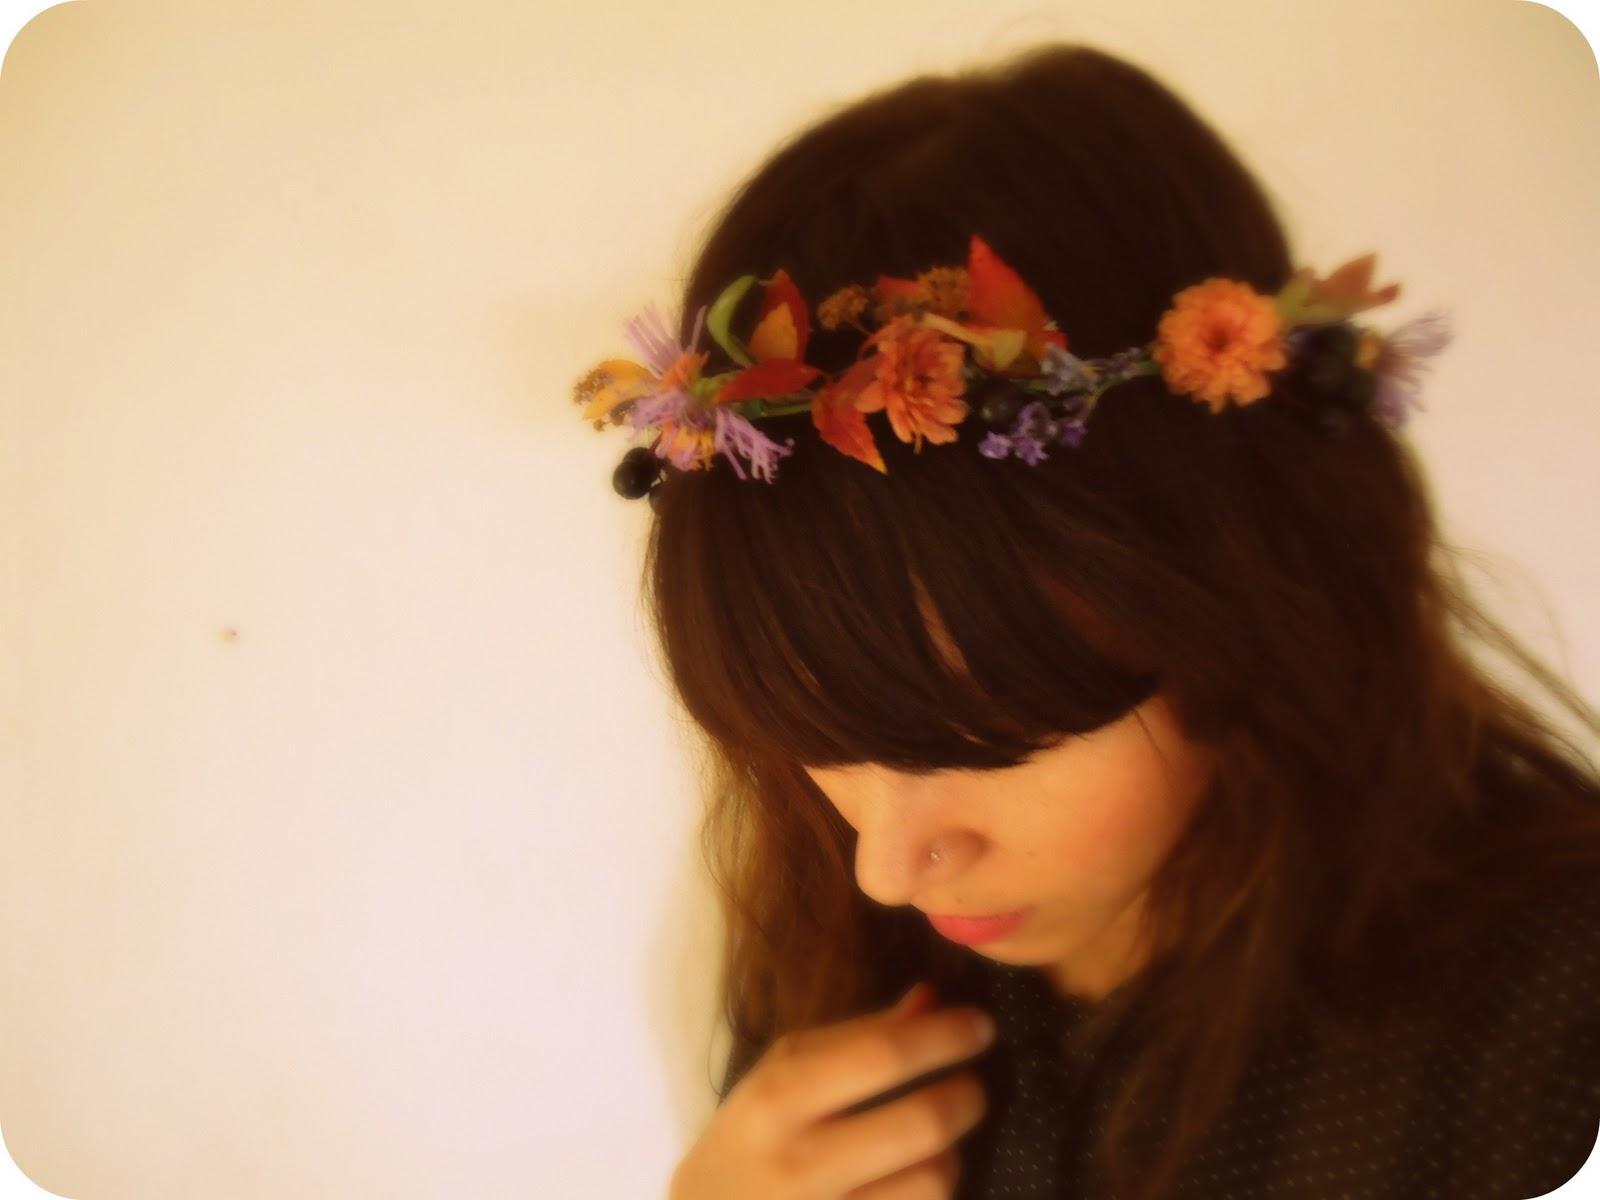 Girl with flower crown tumblr crazywidowfo girl with flower crown tumblr izmirmasajfo